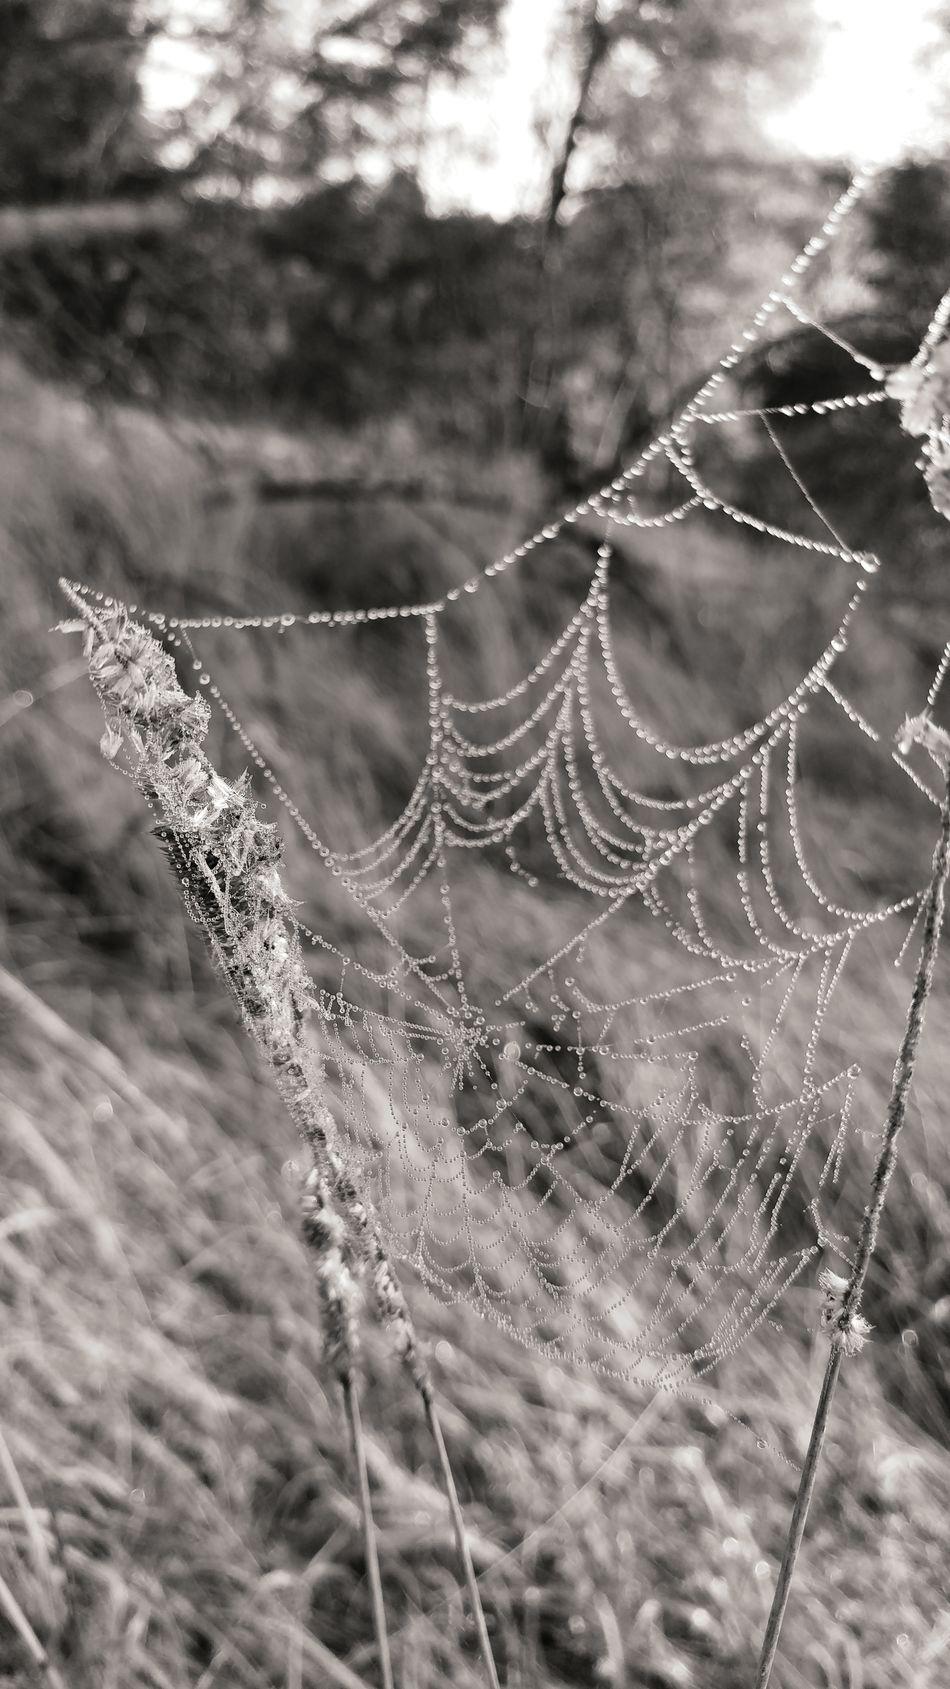 Spider Web Spiders Web Spidersweb Natura Nature Black And White Czarno-białe Black & White Czarnobiałe Grass Trawa Lg G5 LG  Lgg5photography Smartphonephotography Smartphone Photography Monochrome Photography